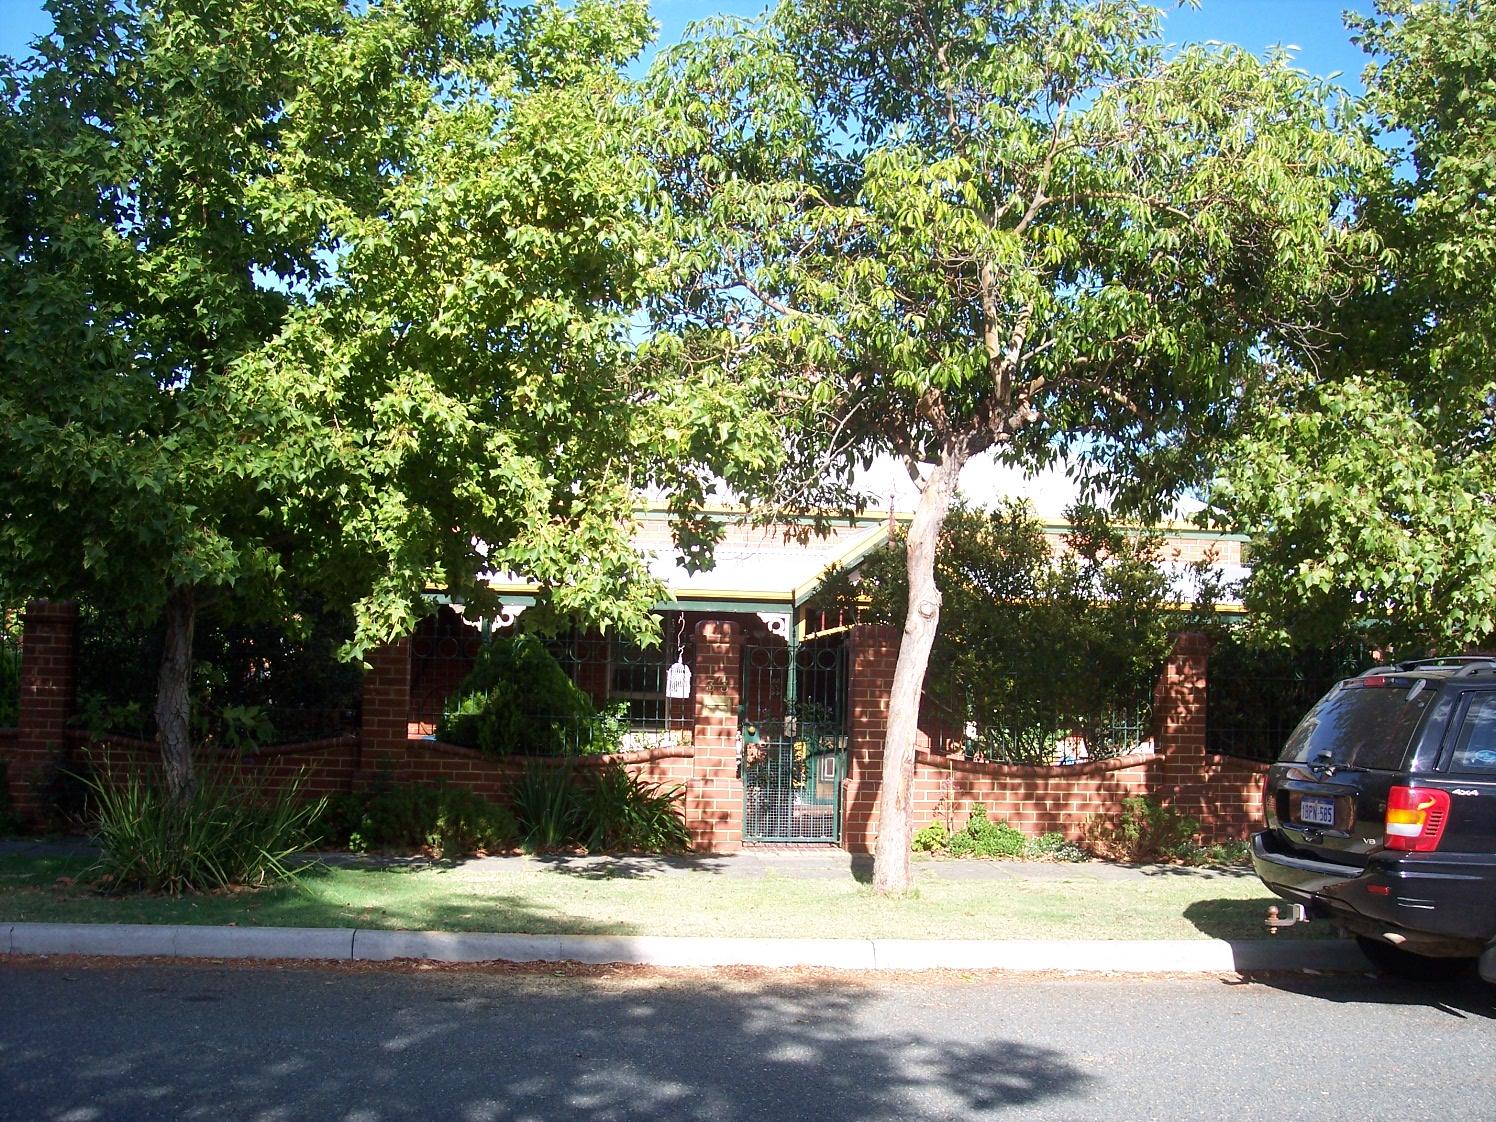 25-1-07 View W 33 Bedford Street.jpg